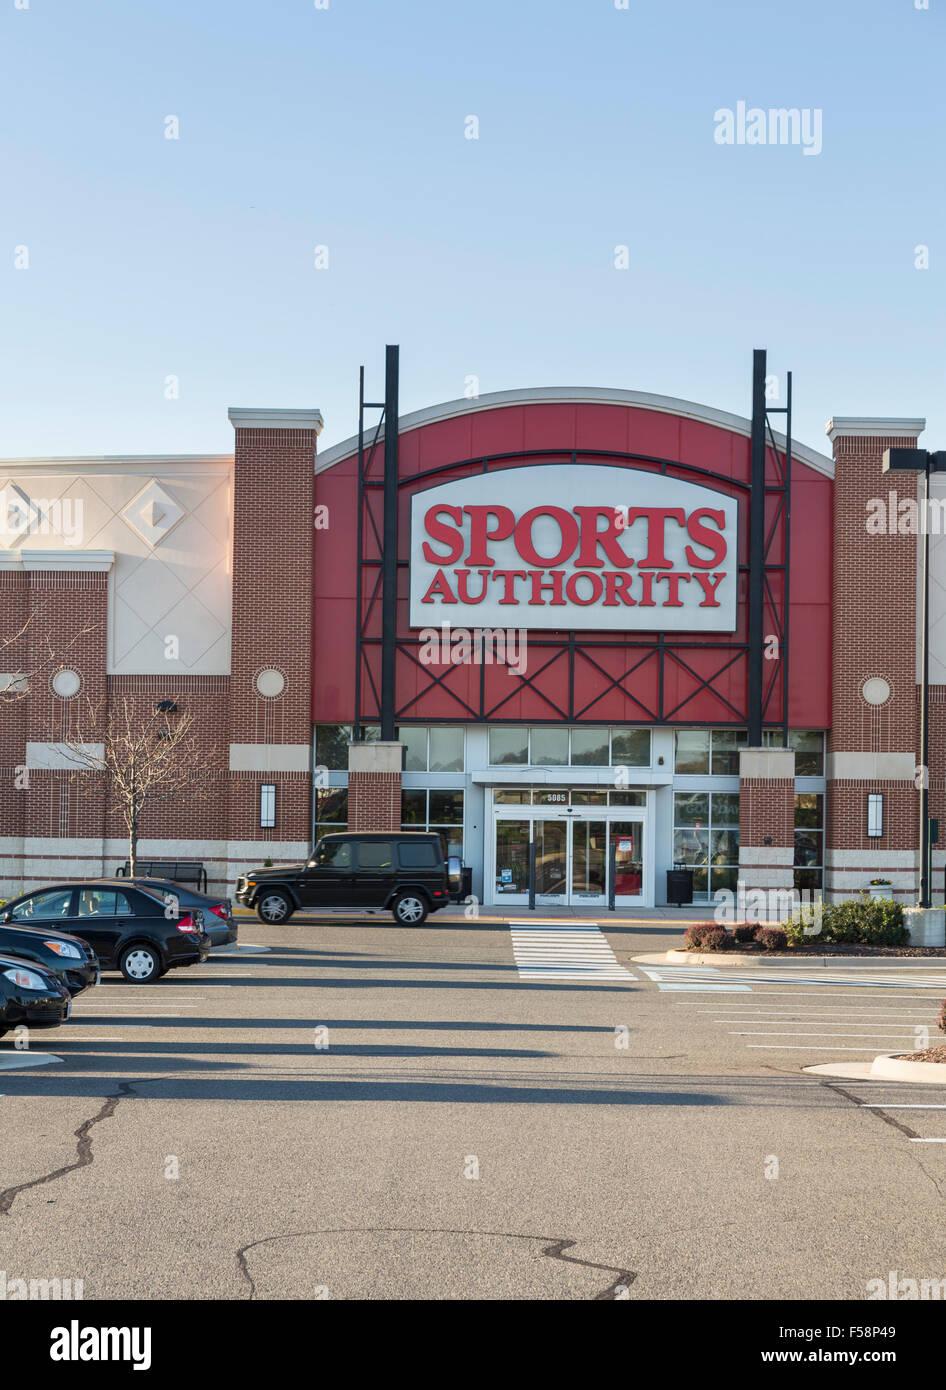 Sports Authority almacenar / superstore en Virginia centro comercial Gateway, Gainesville, Virginia, EE.UU. Imagen De Stock